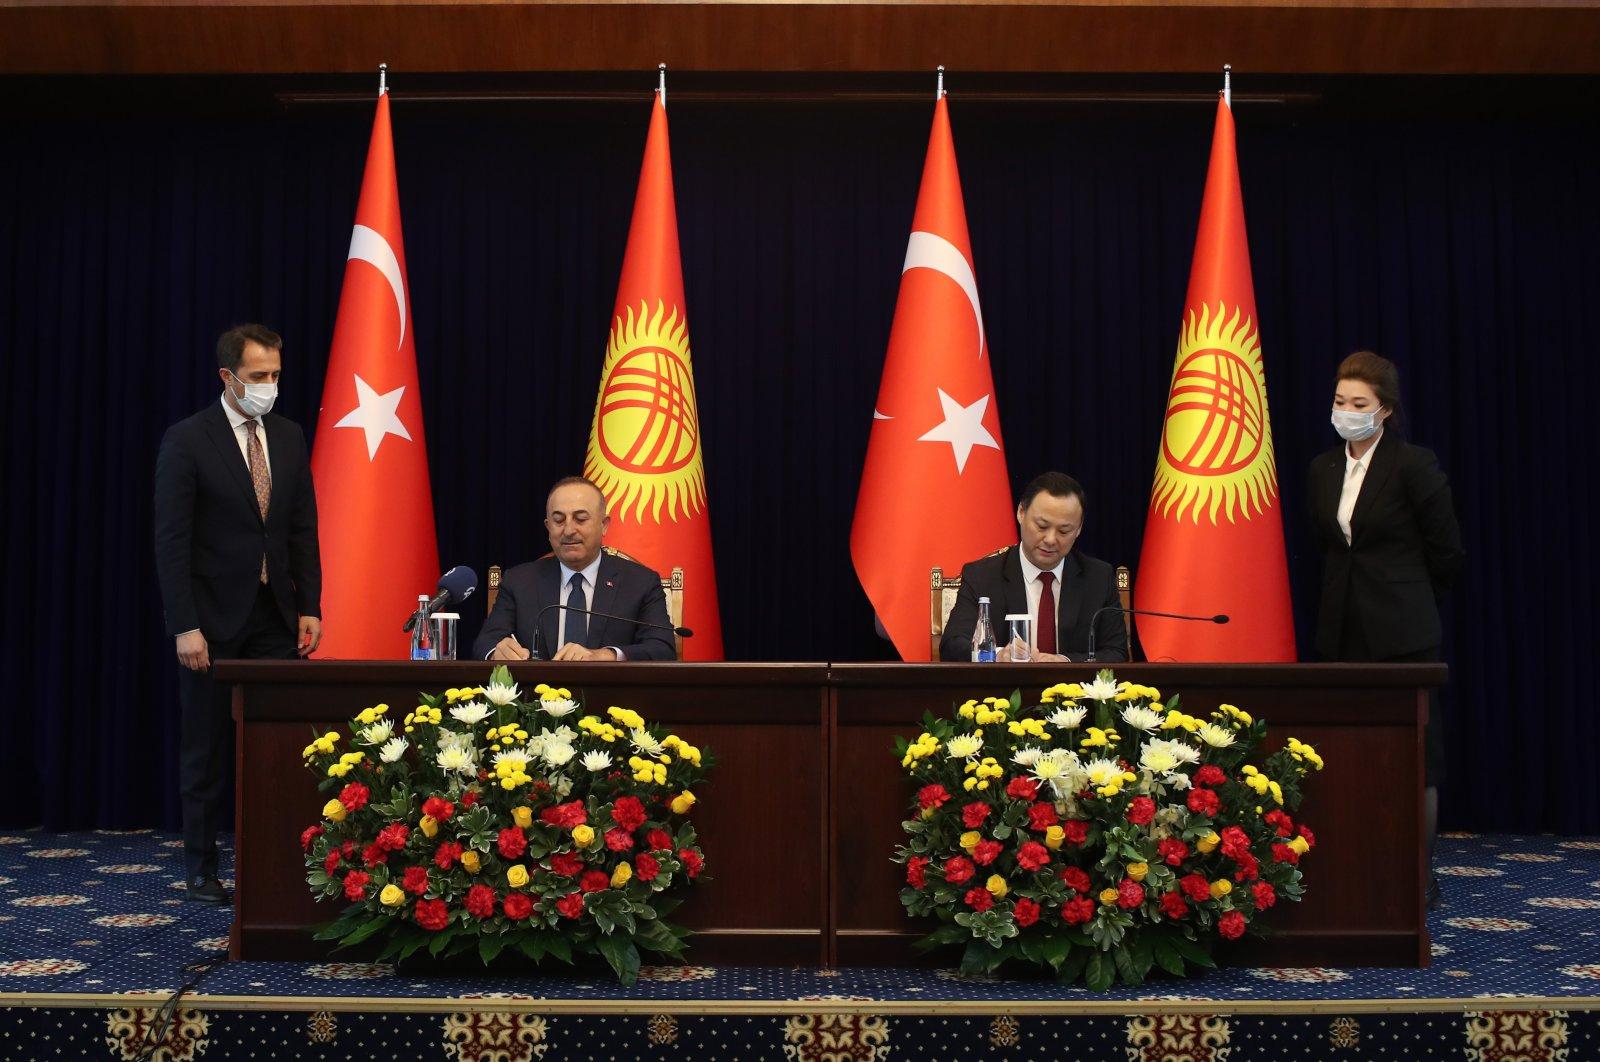 Foreign Minister Mevlüt Çavuşoğlu (L) and his Kyrgyz counterpart Ruslan Kazakbaev during a press conference in Bishkek, Kyrgyzstan, March 10, 2021. (AA Photo)